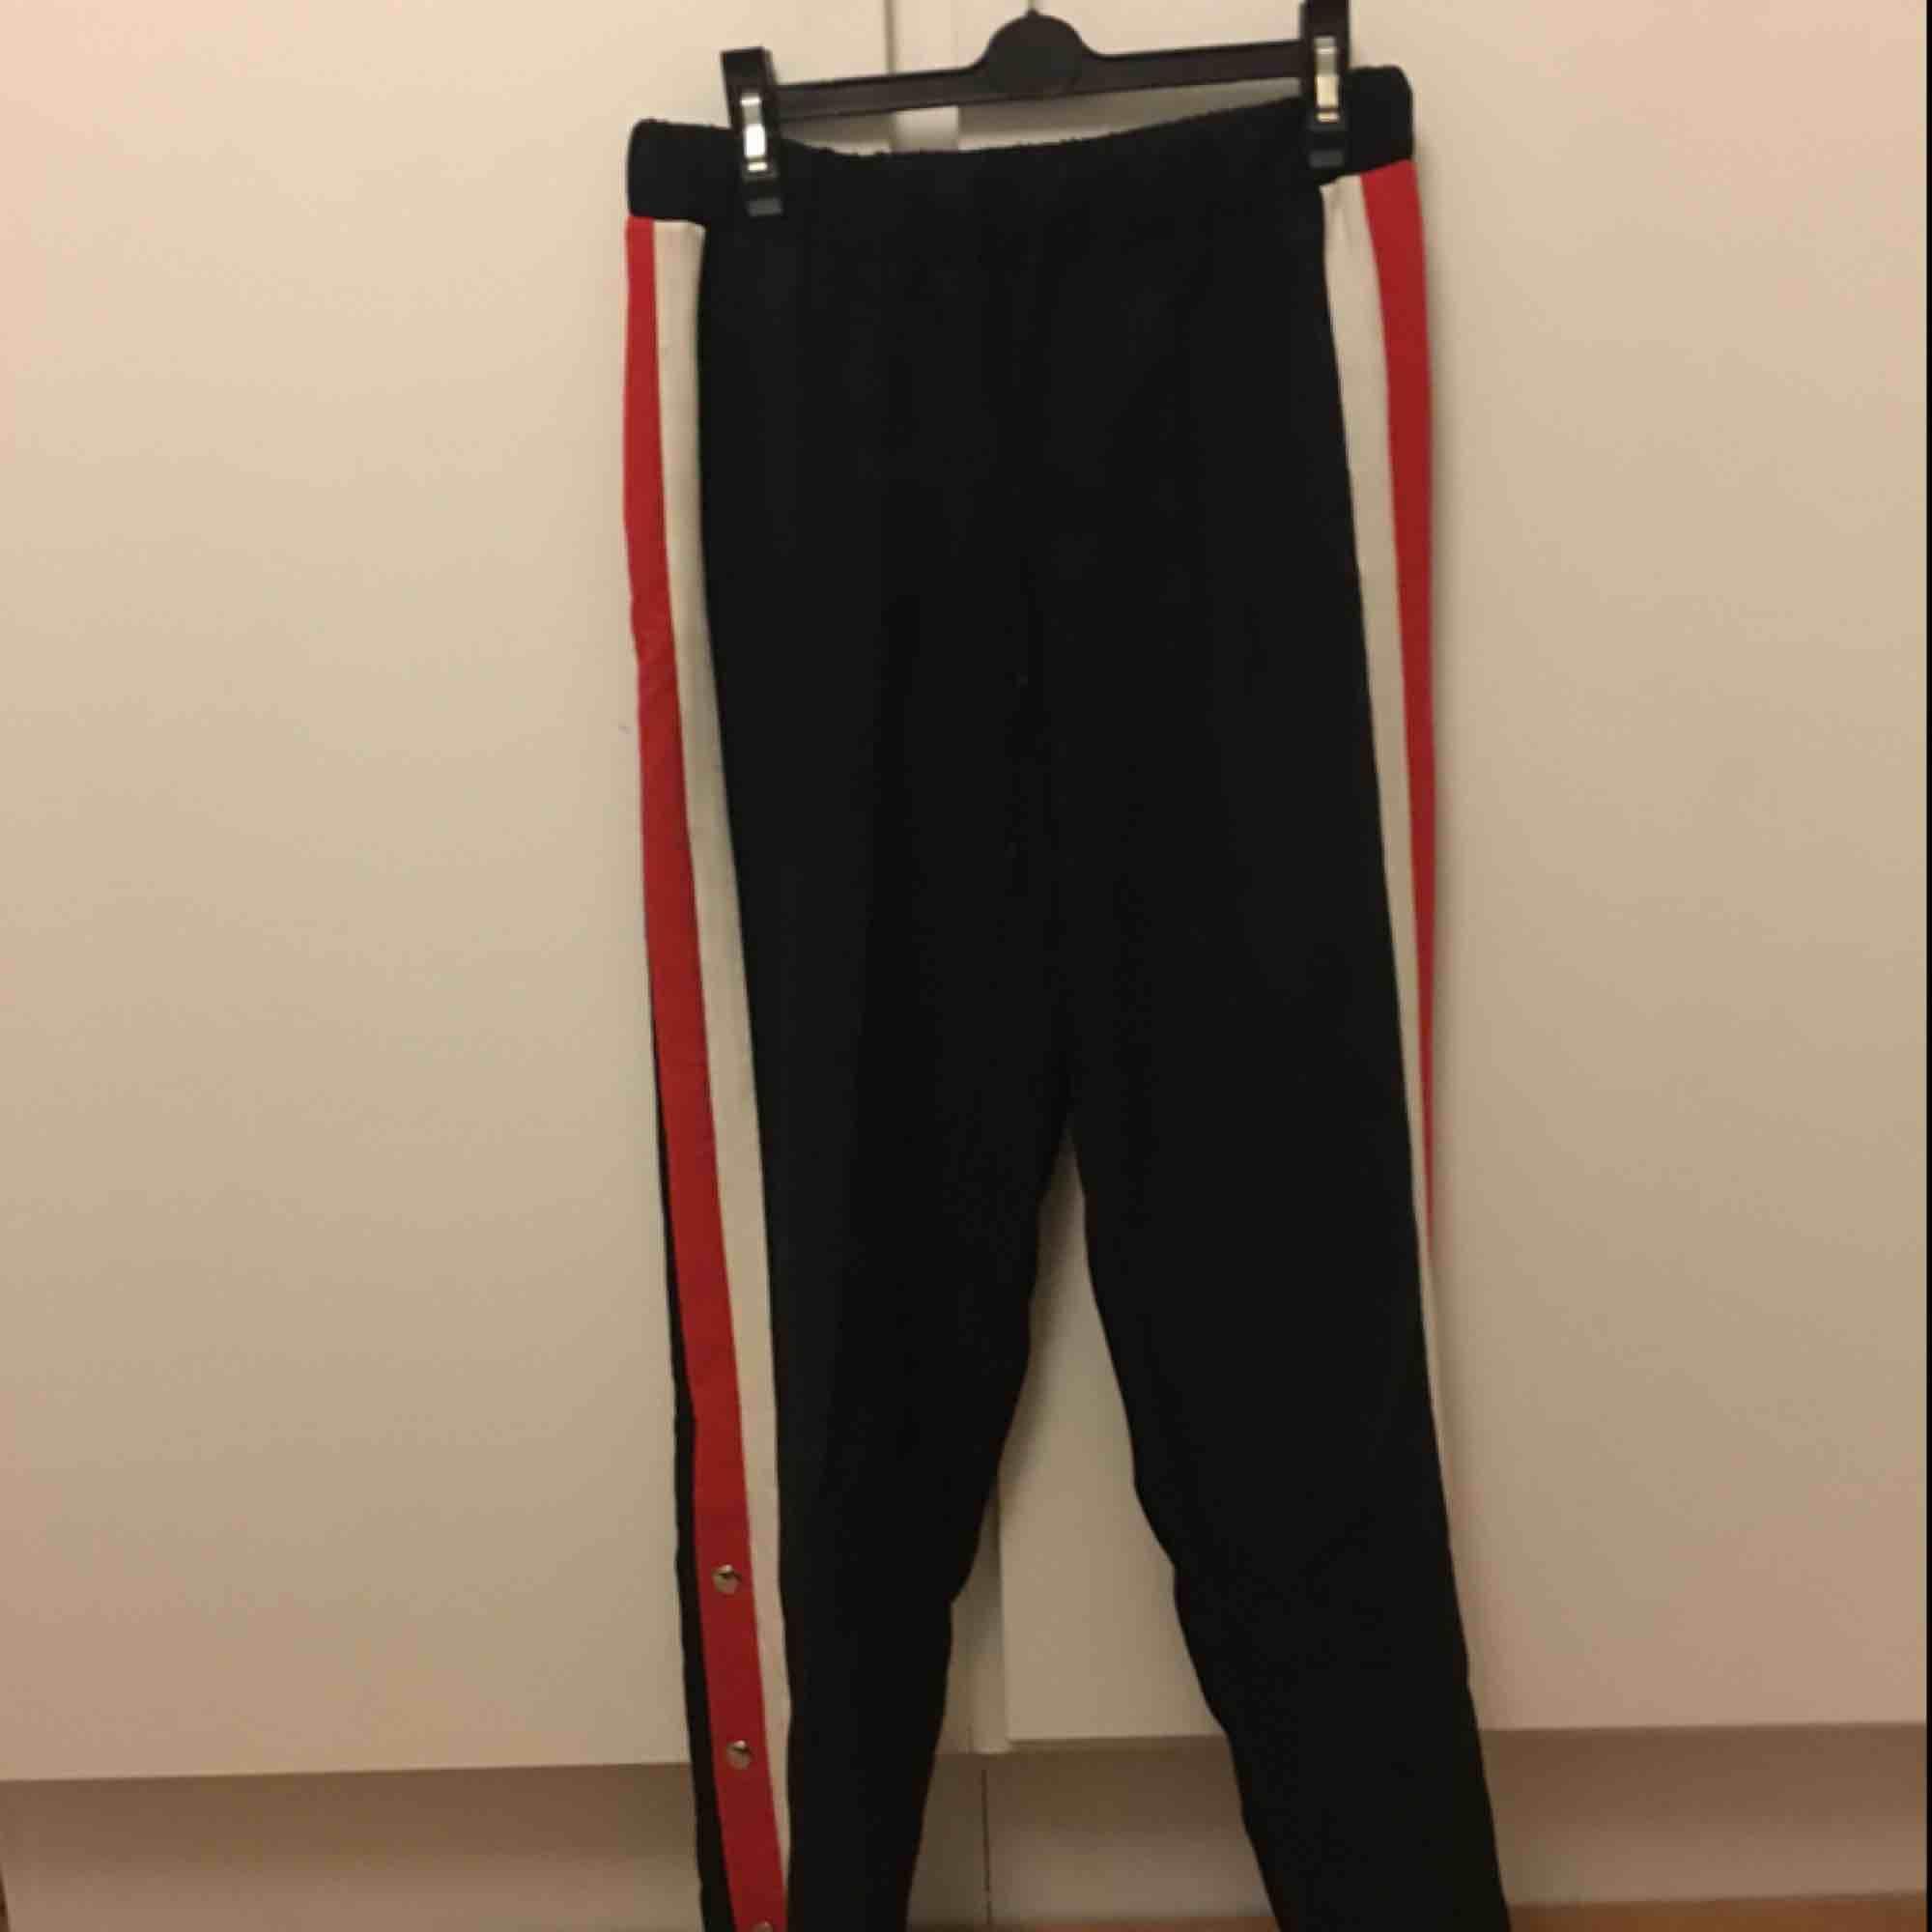 Svarta popperpants med rödvit rand på benen. Knytning i midjan. Frakt på 69kr tillkommer. . Jeans & Byxor.